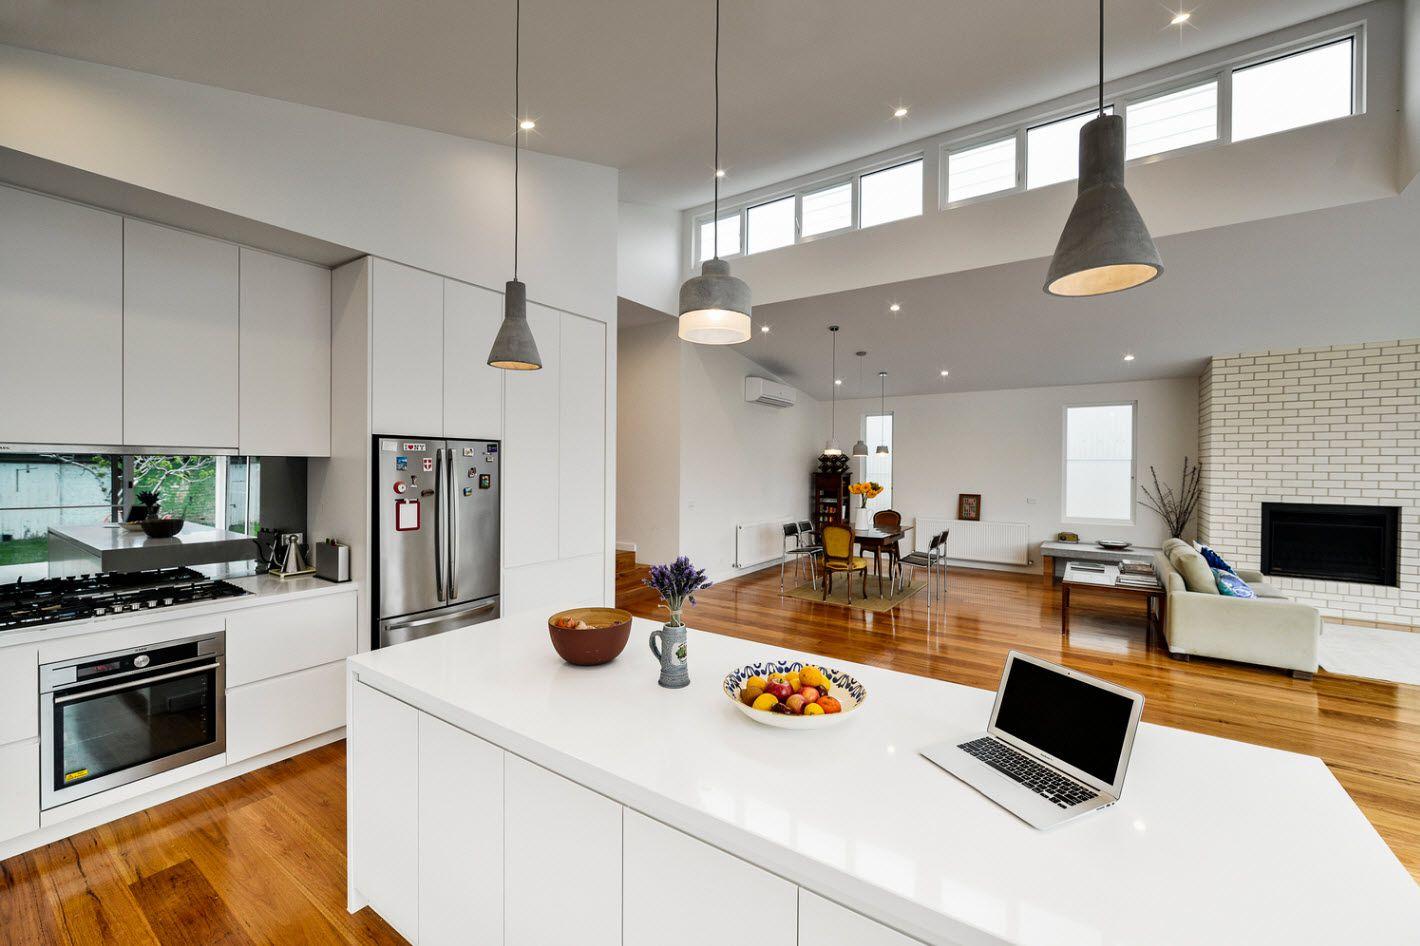 Moderno Modernas Imágenes De Cocina Australia Bandera - Ideas de ...